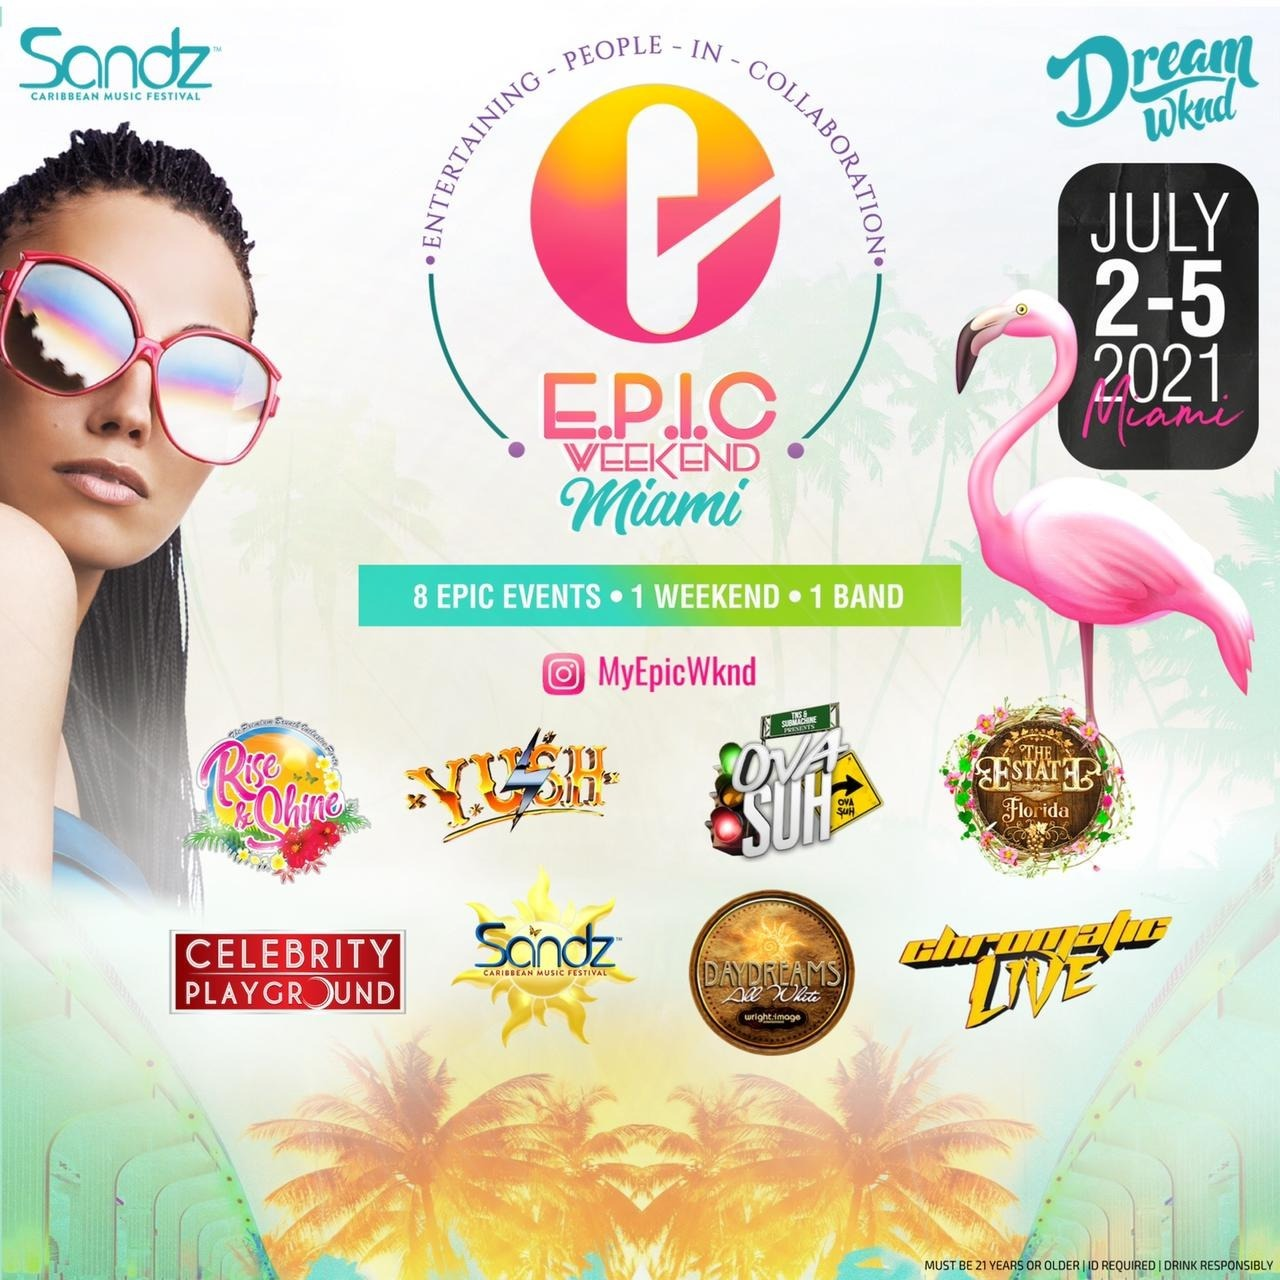 EPIC Weekend Miami